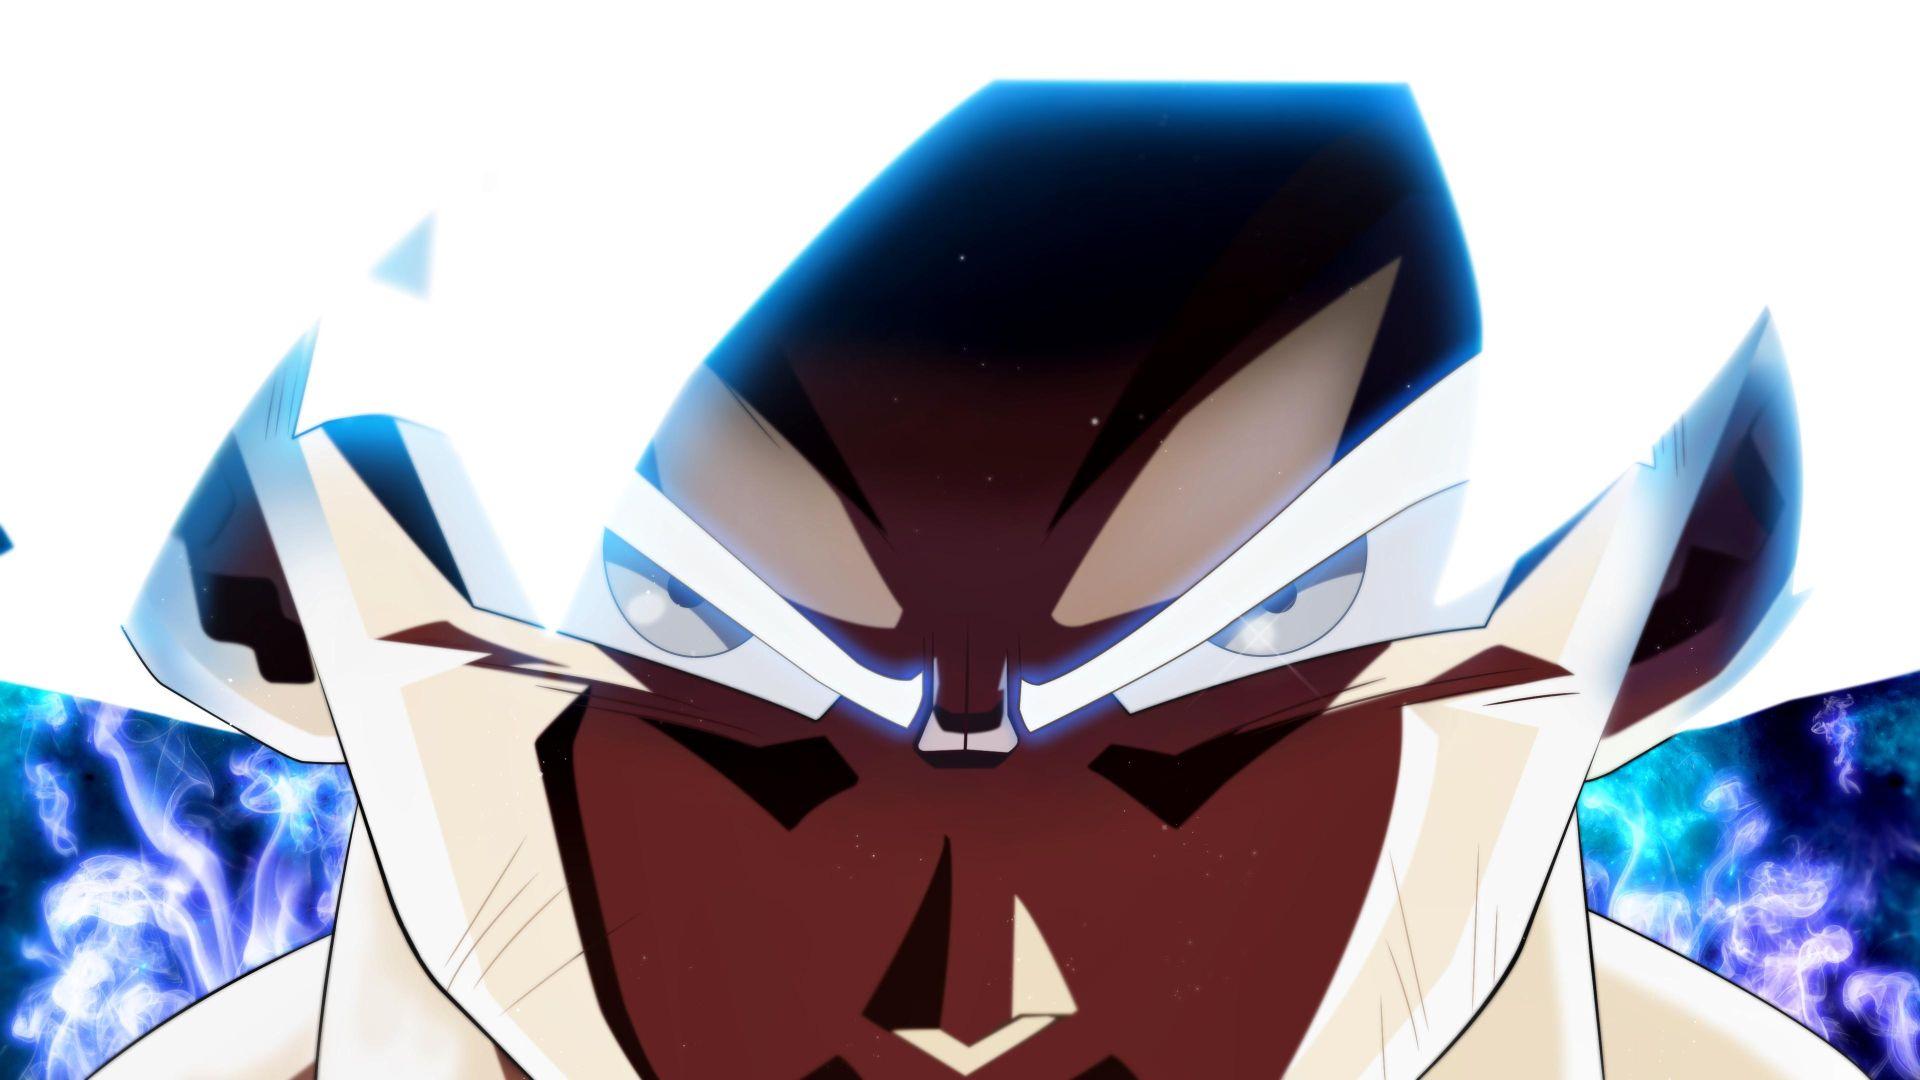 Mastered Ultra Instinct Goku Wallpaper In 1920x1080 Resolution